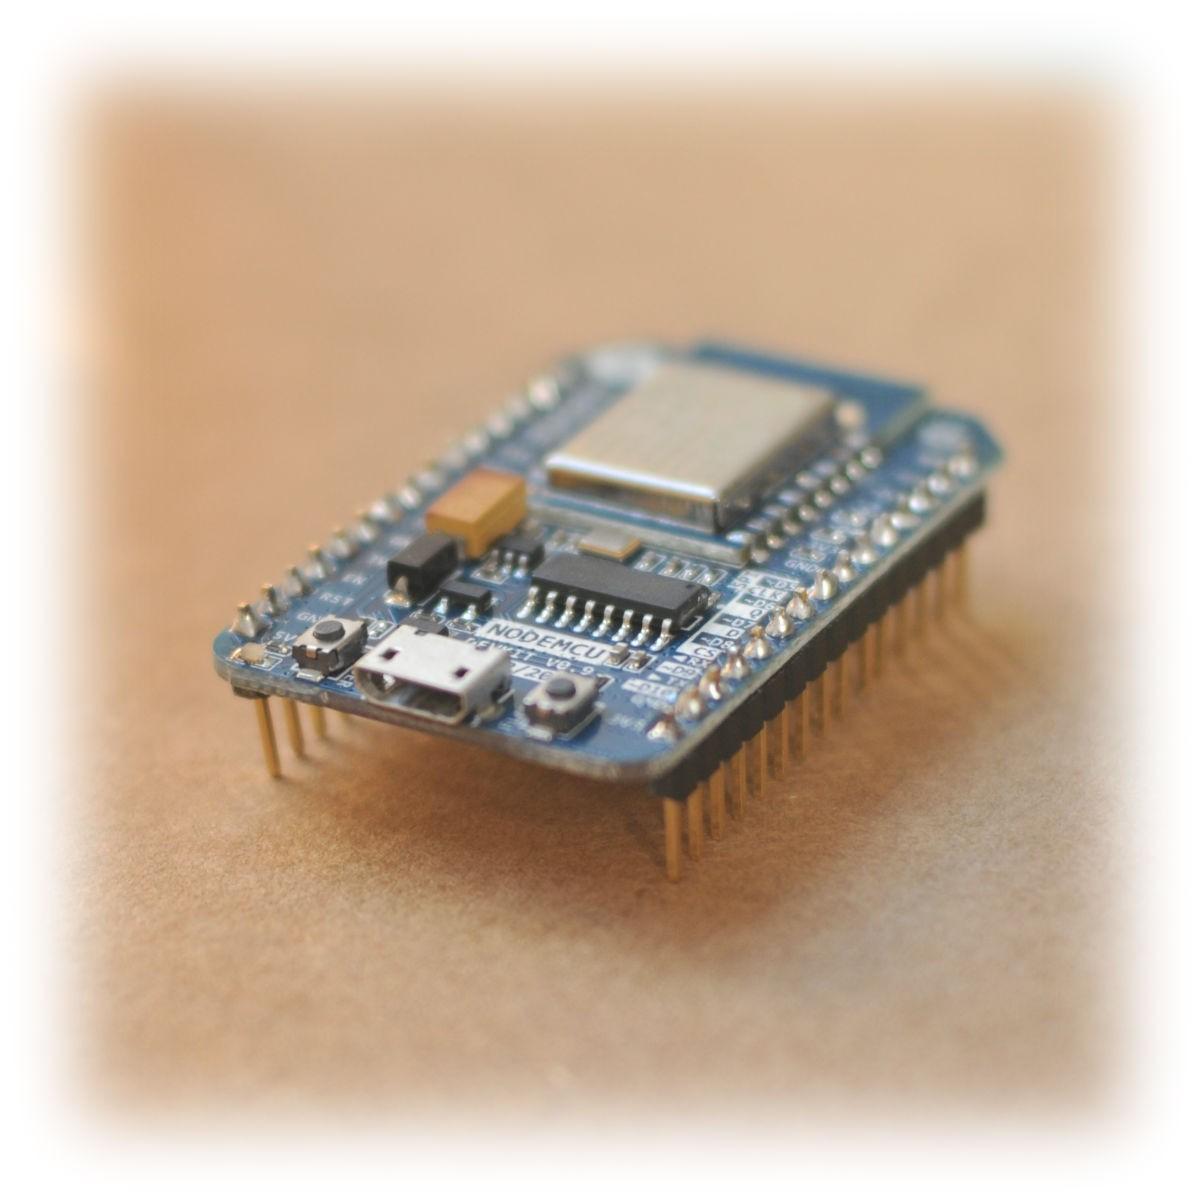 Nodemcu An Open Source Firmware Based On Esp8266 Wifi Soc Wireless Sd Shield Arduino Schematic